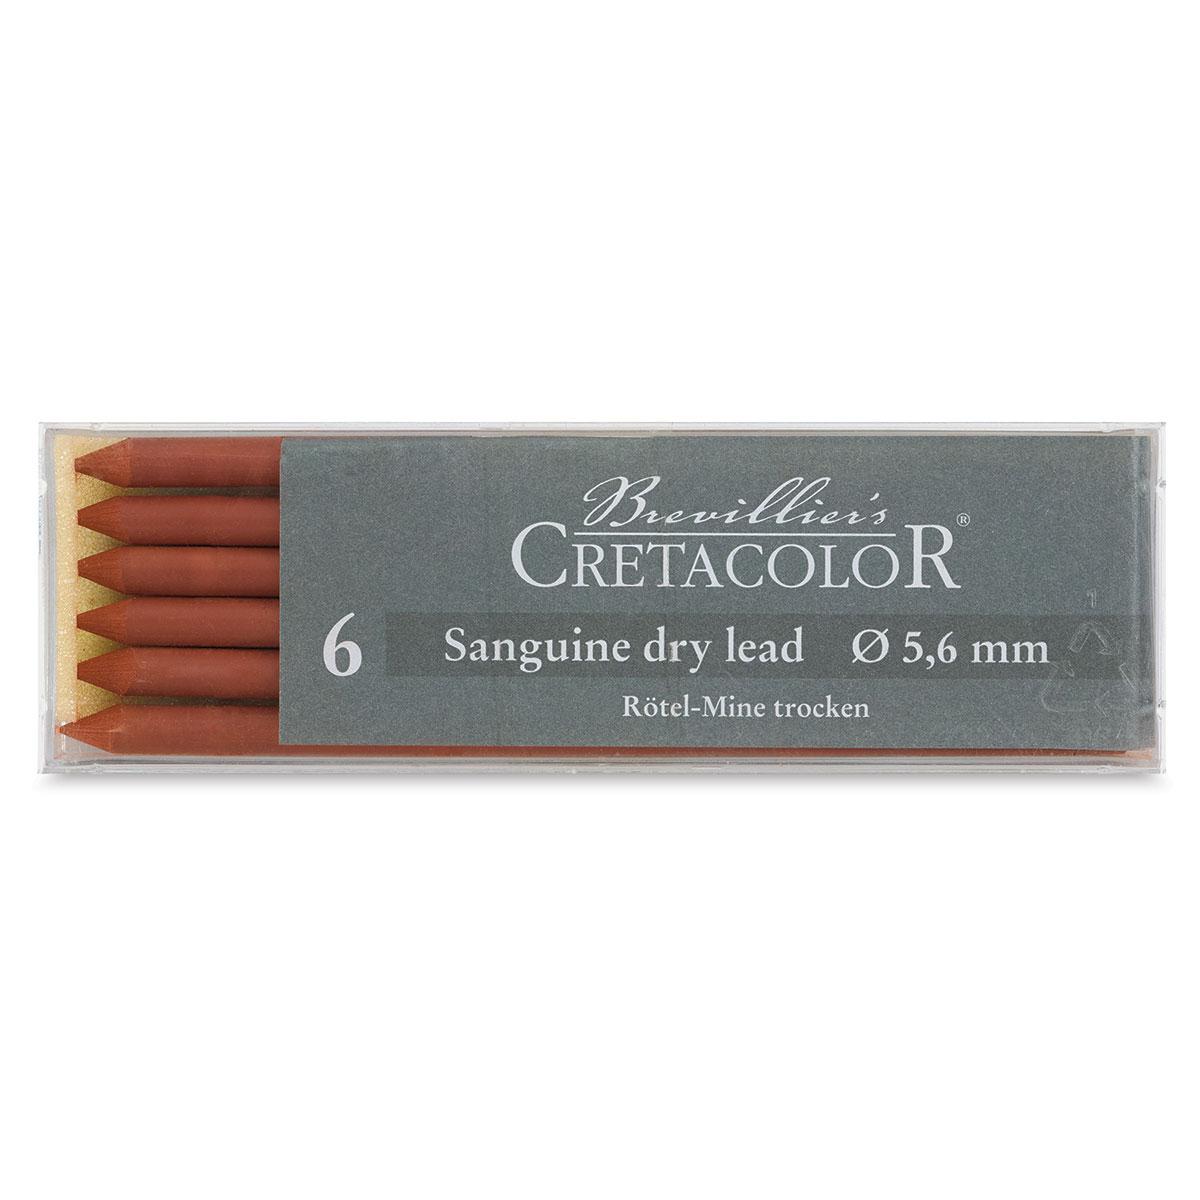 Cretacolor Artist Lead Sanguine Dry 6 Pack